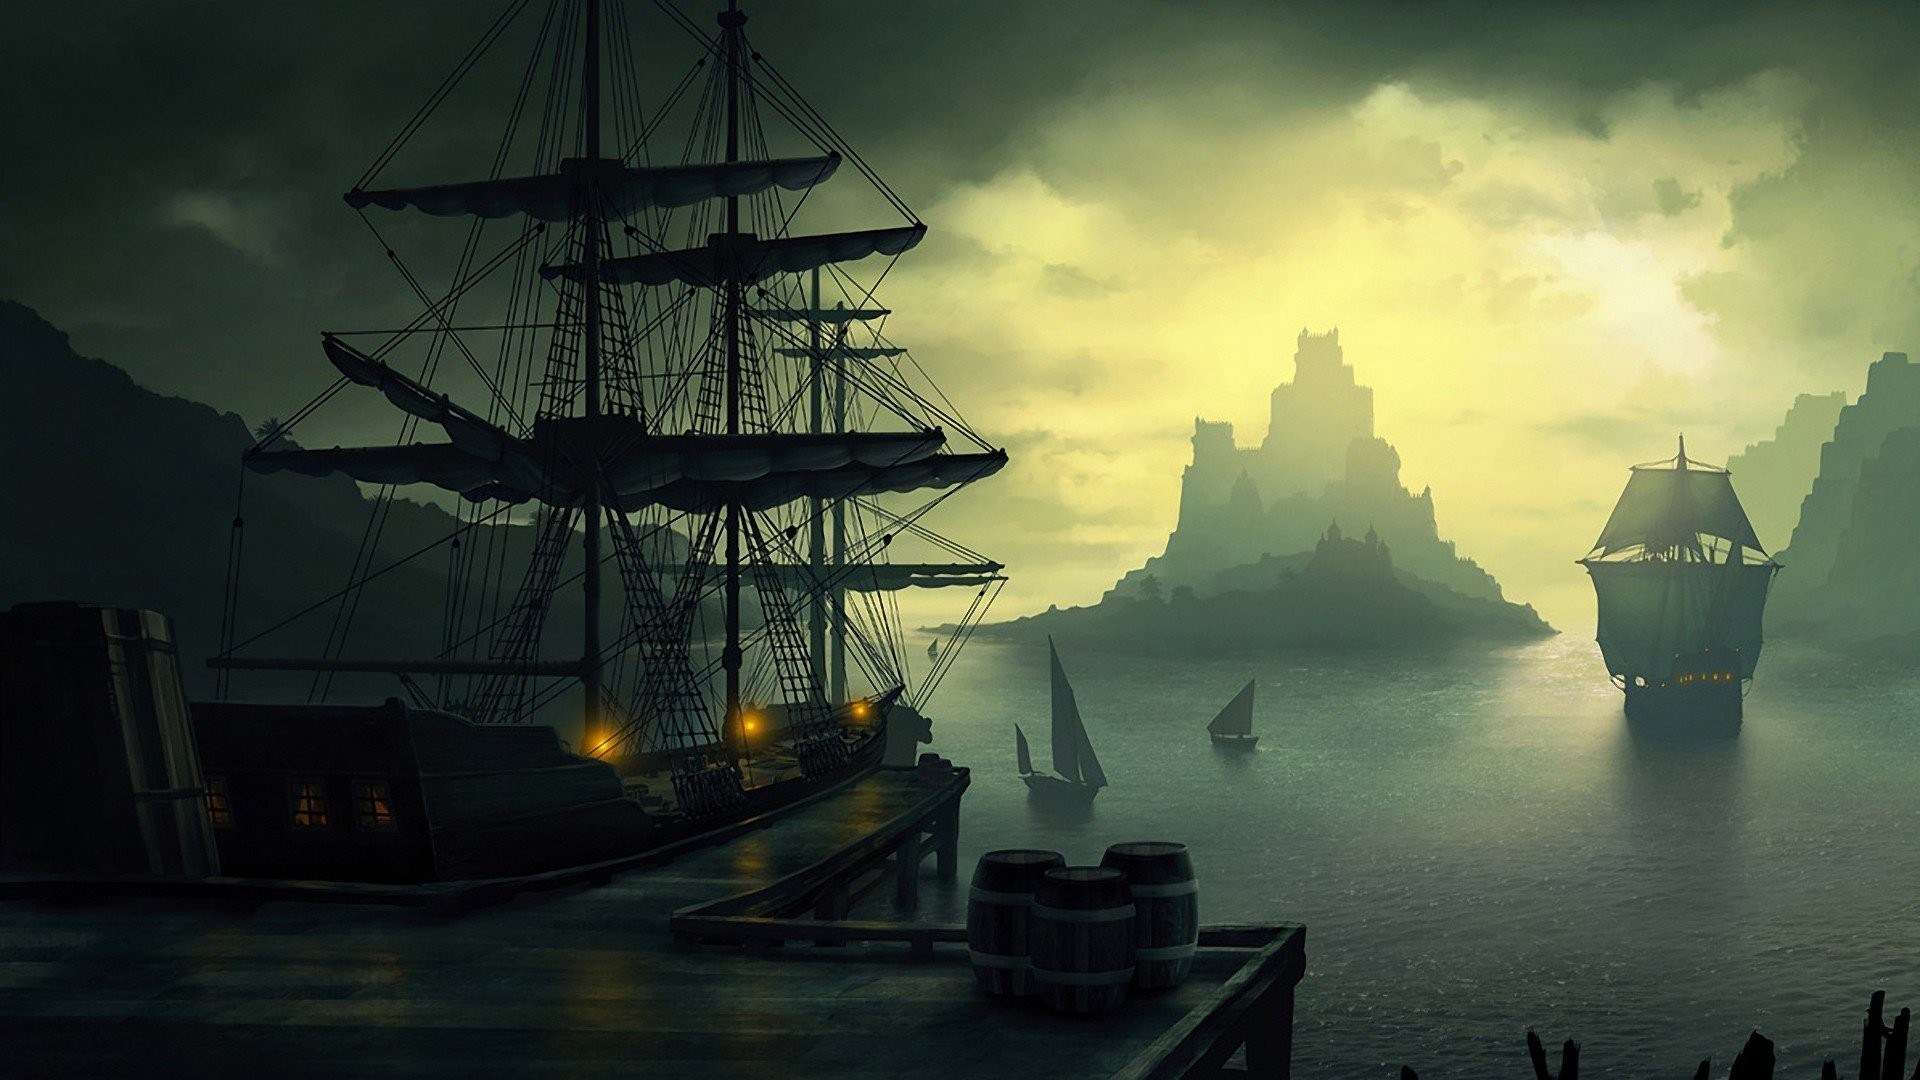 old ship, Ship, Barrels, Clouds, Sailing, Lantern, Sun, Island, Bay, Dock  Wallpapers HD / Desktop and Mobile Backgrounds